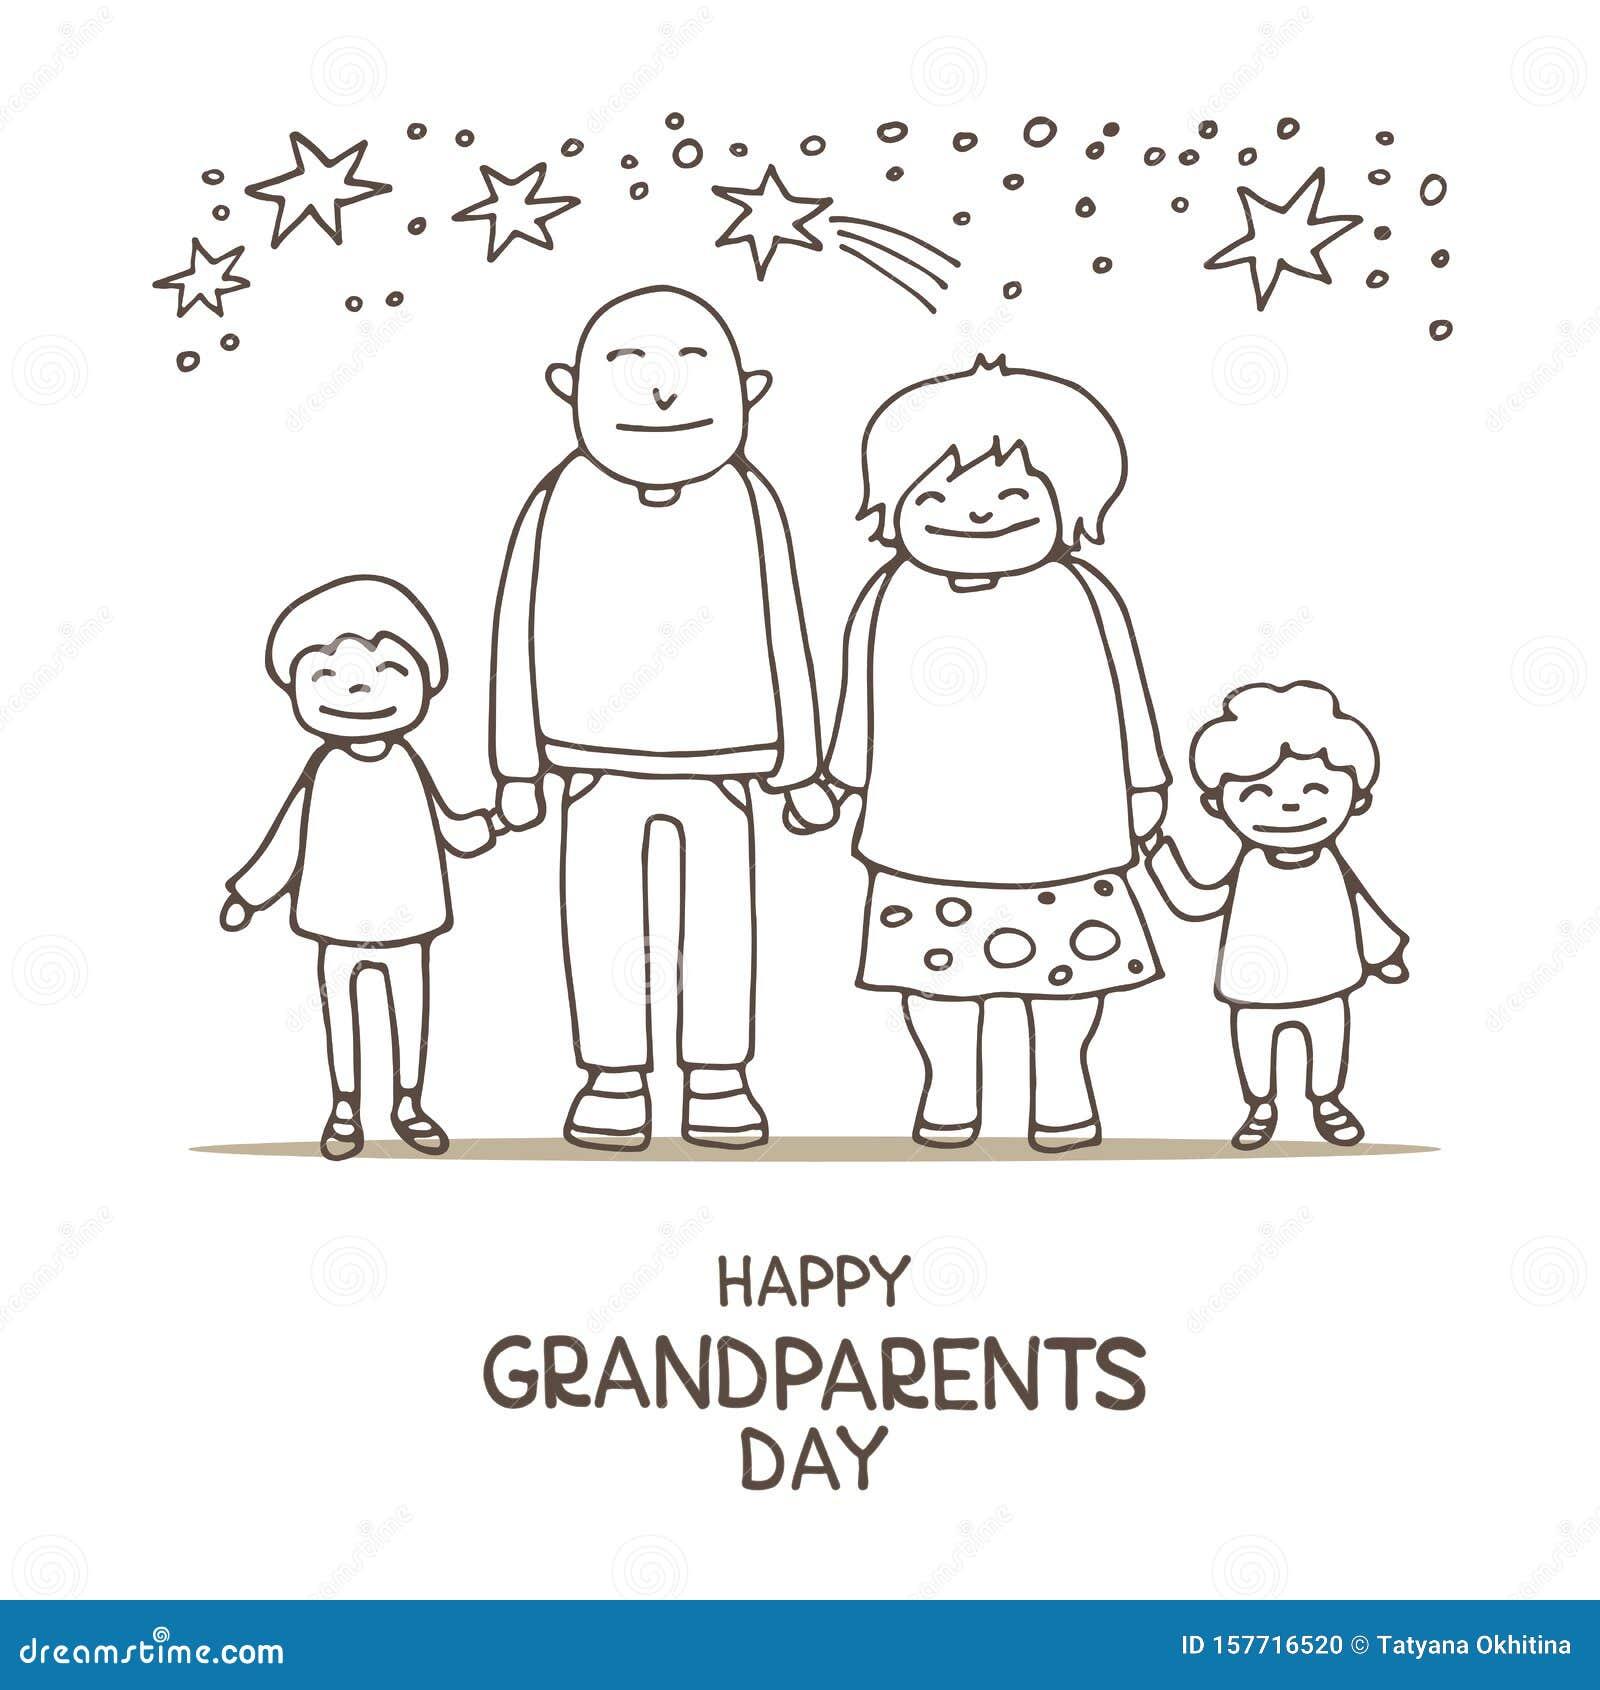 Grandparents day-09